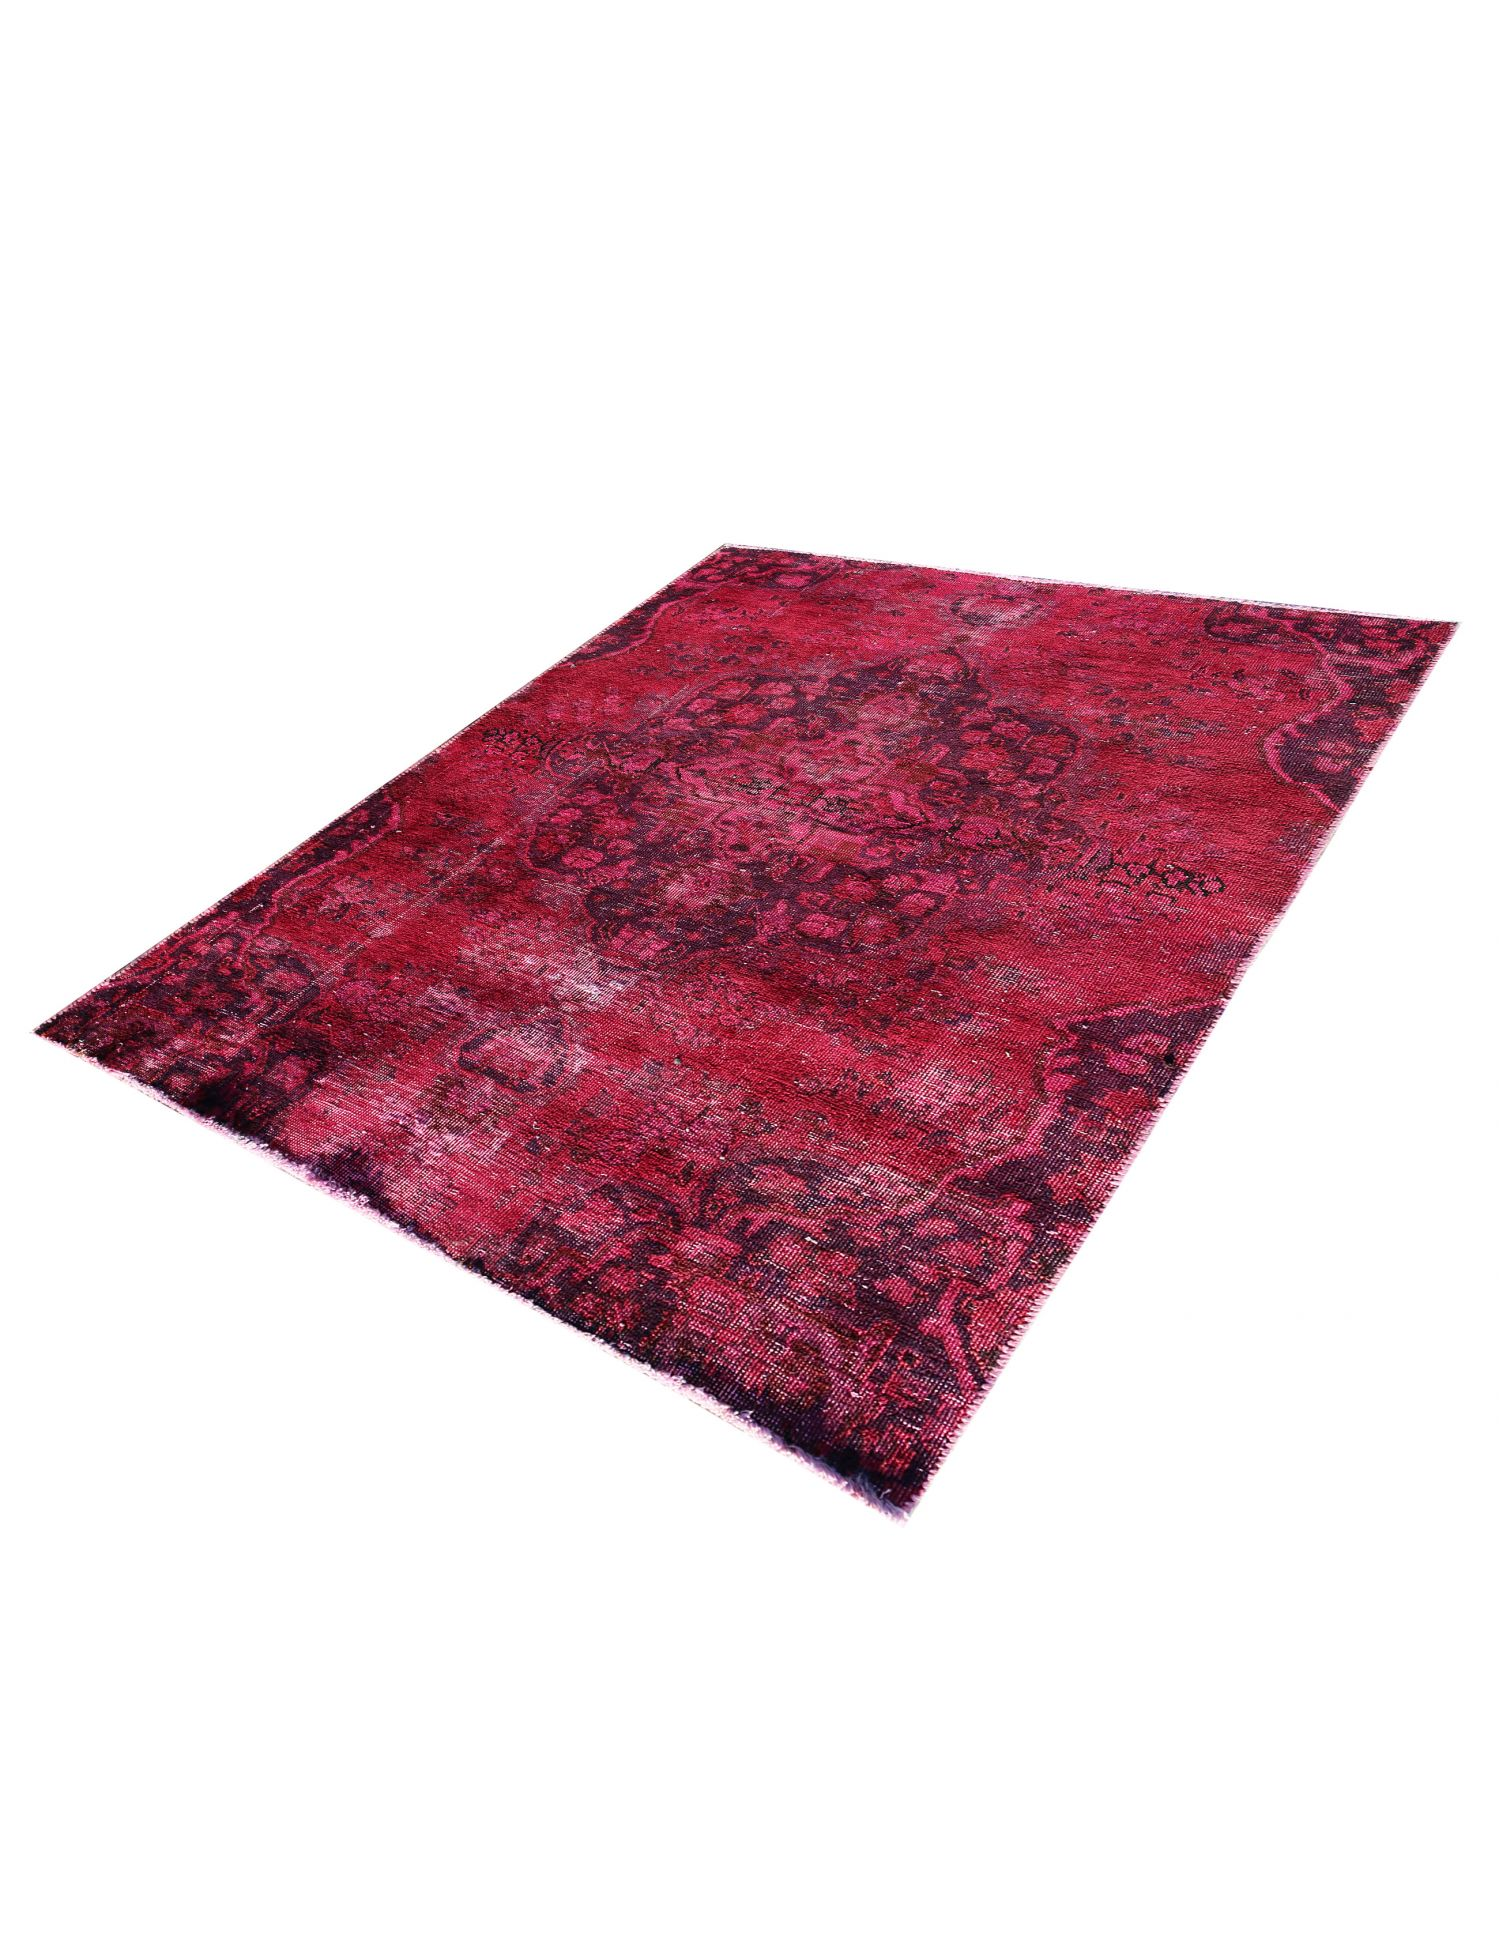 Vintage Teppich  rot <br/>177 x 129 cm